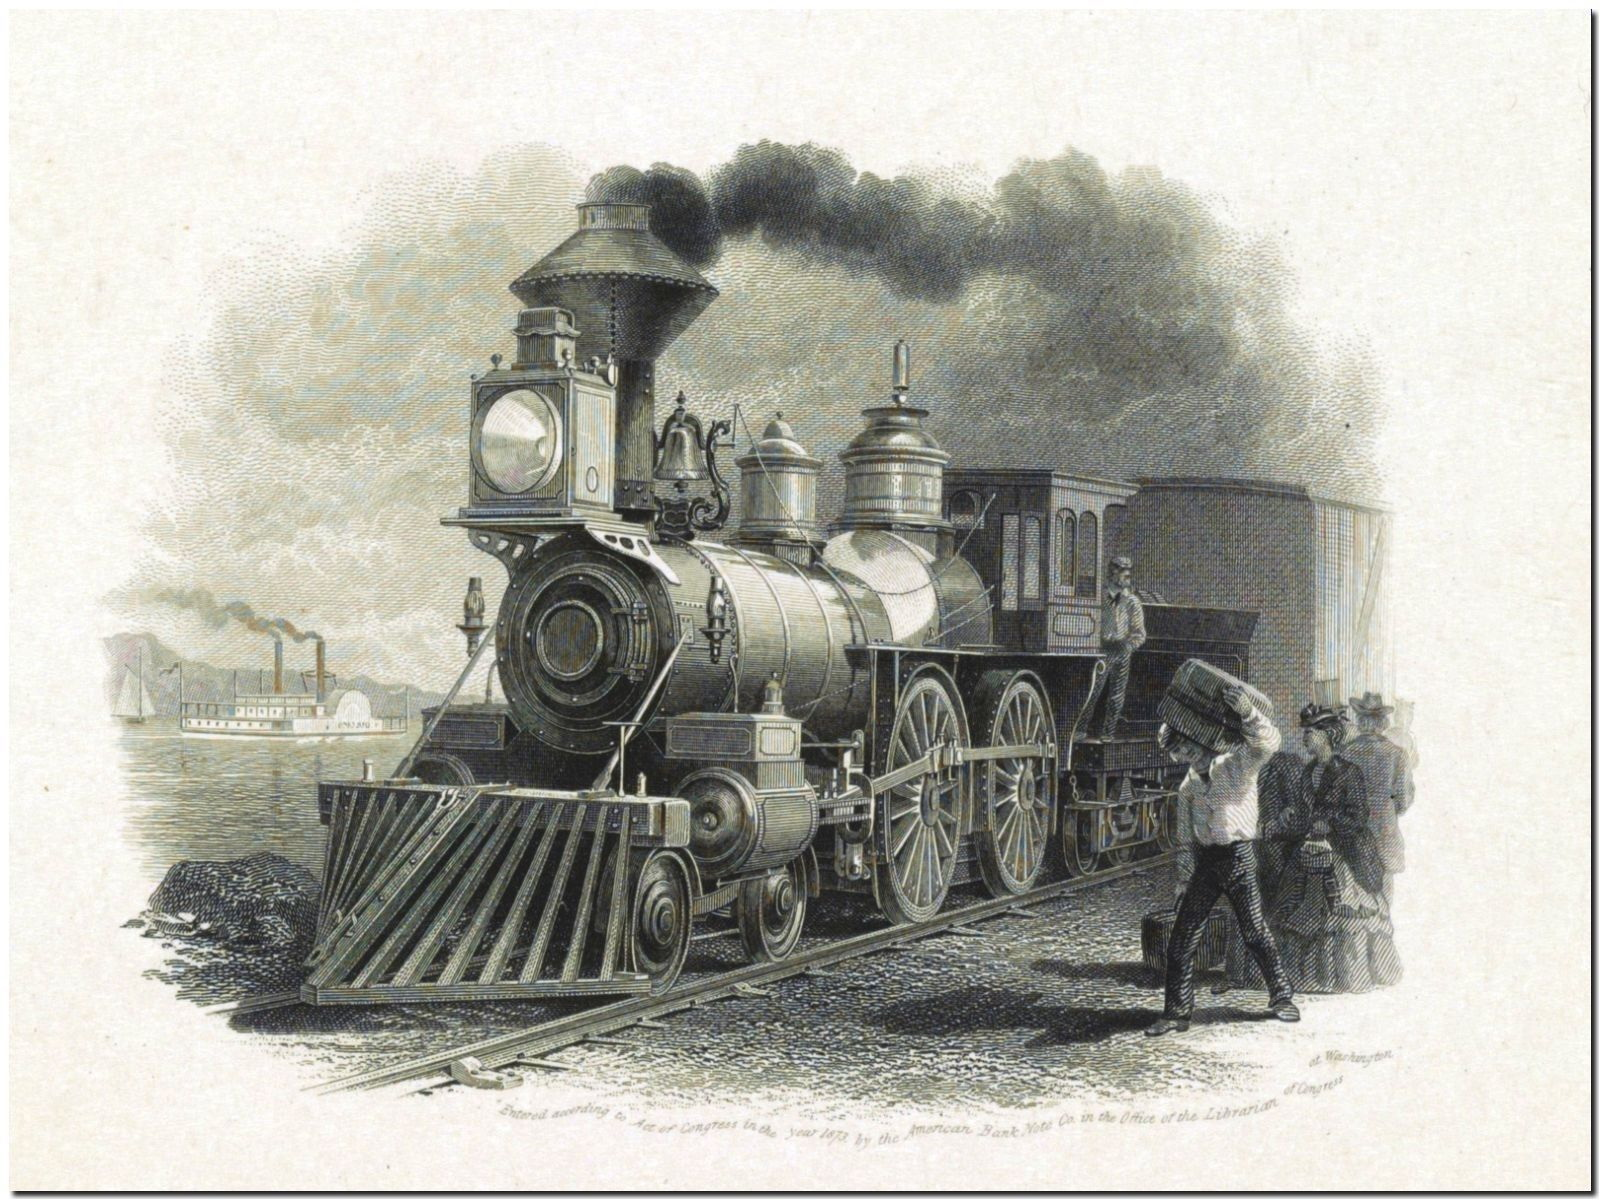 178909 VINTAGE STEAM TRAIN DECOR WALL PRINT POSTER AU